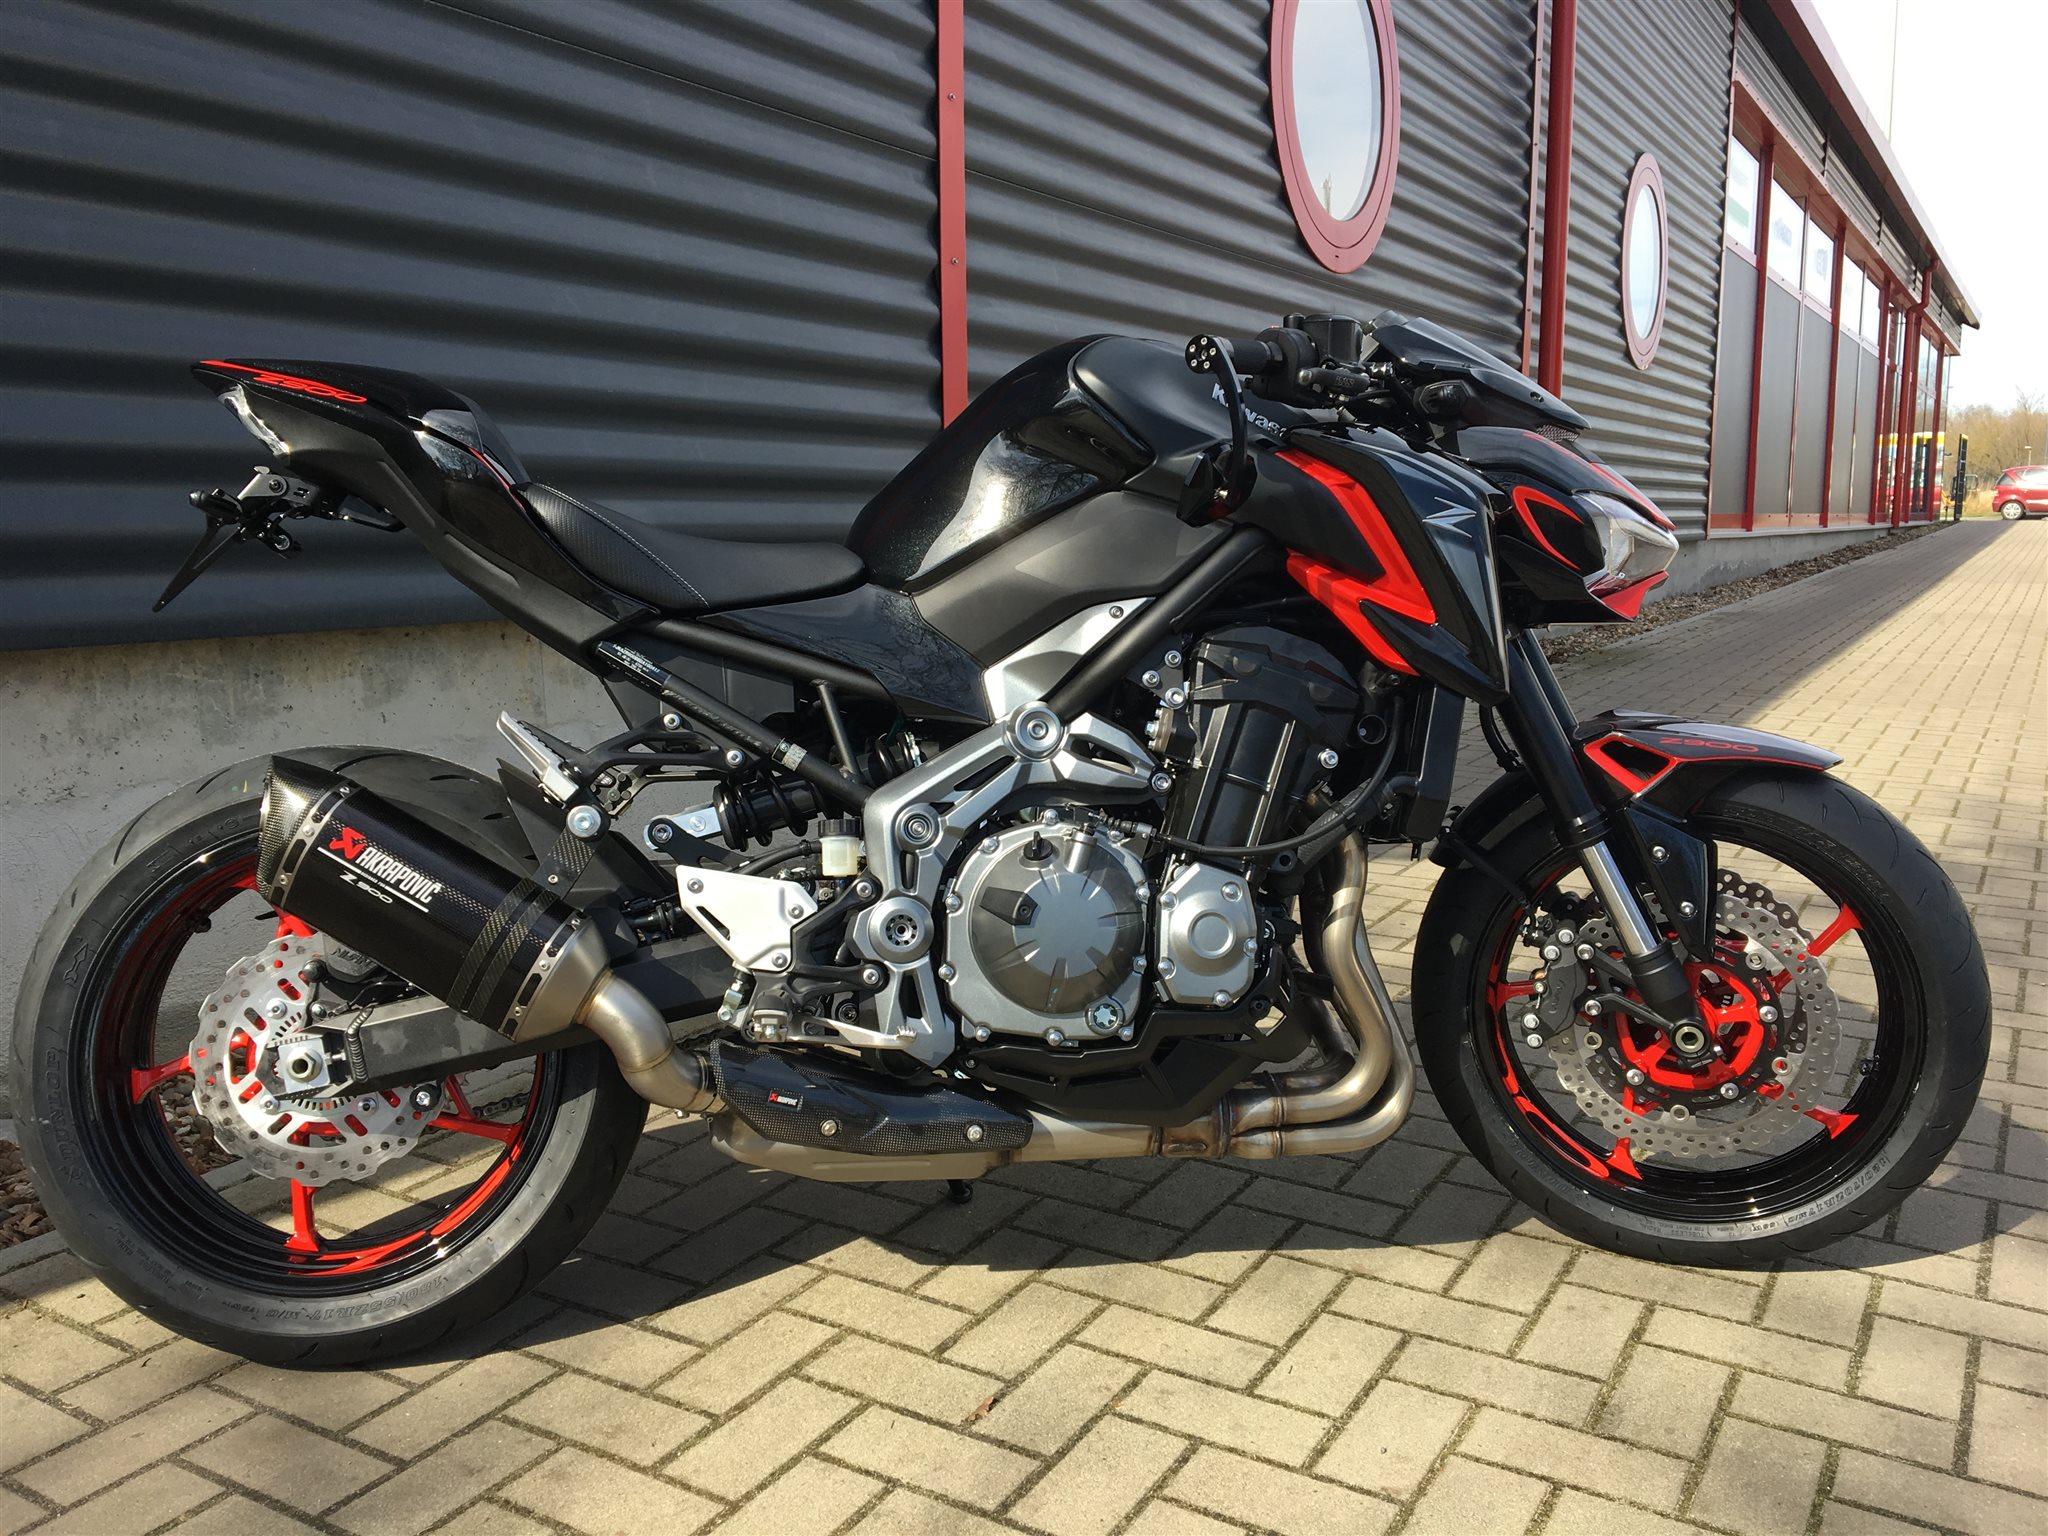 Details Zum Custom Bike Kawasaki Z900 Des Handlers BikerWorld Rosenow